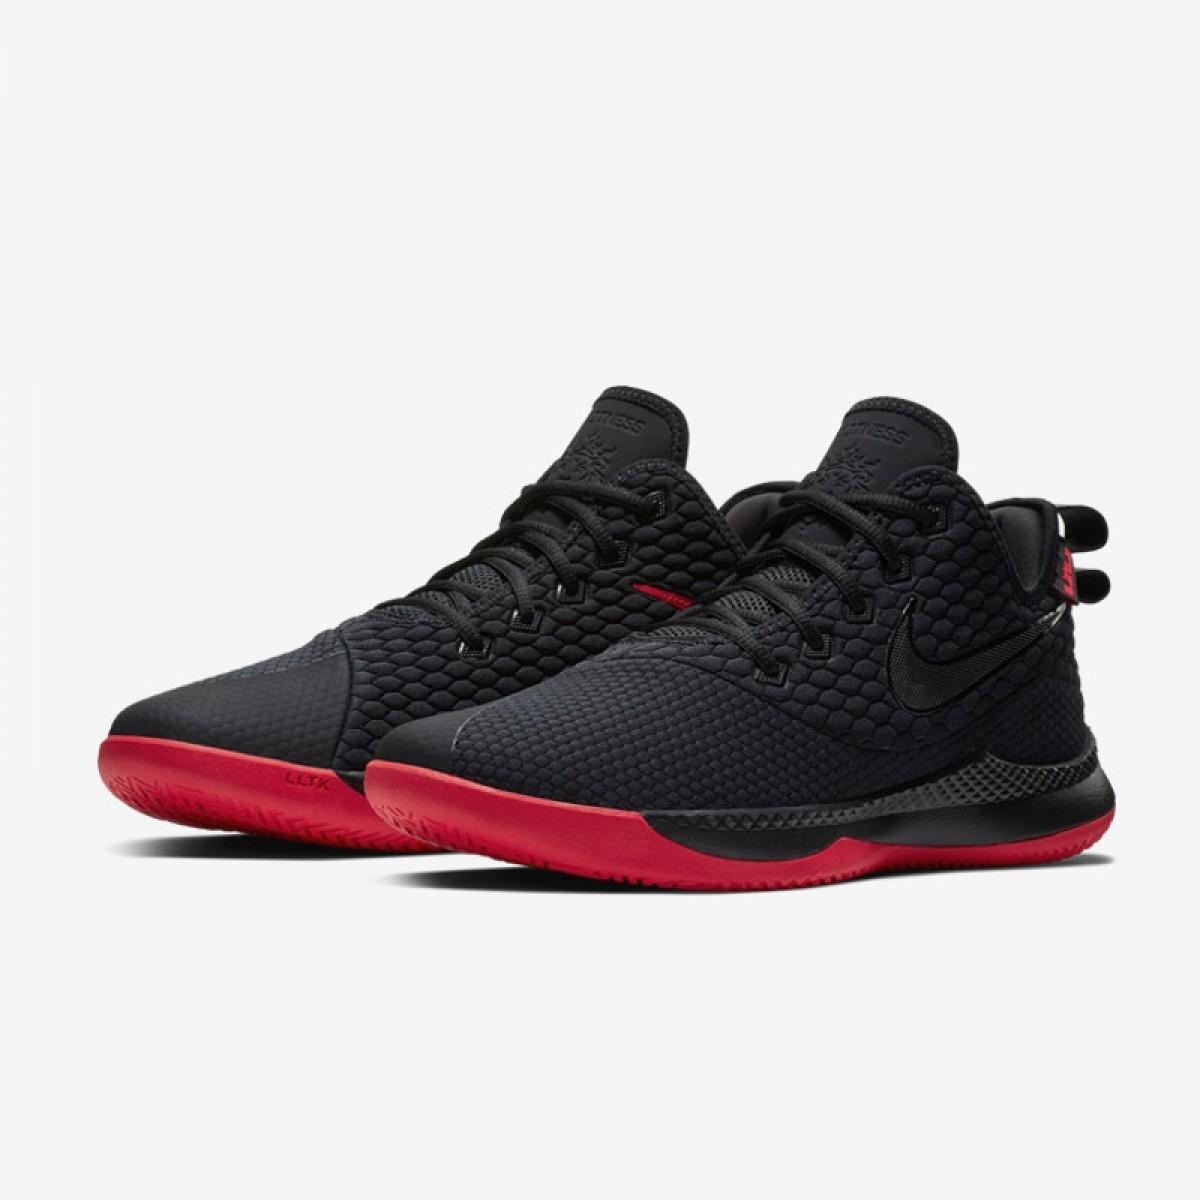 23948ad07e0 Buy Nike Lebron Witness III  Bred  Basketball shoes   sneakers